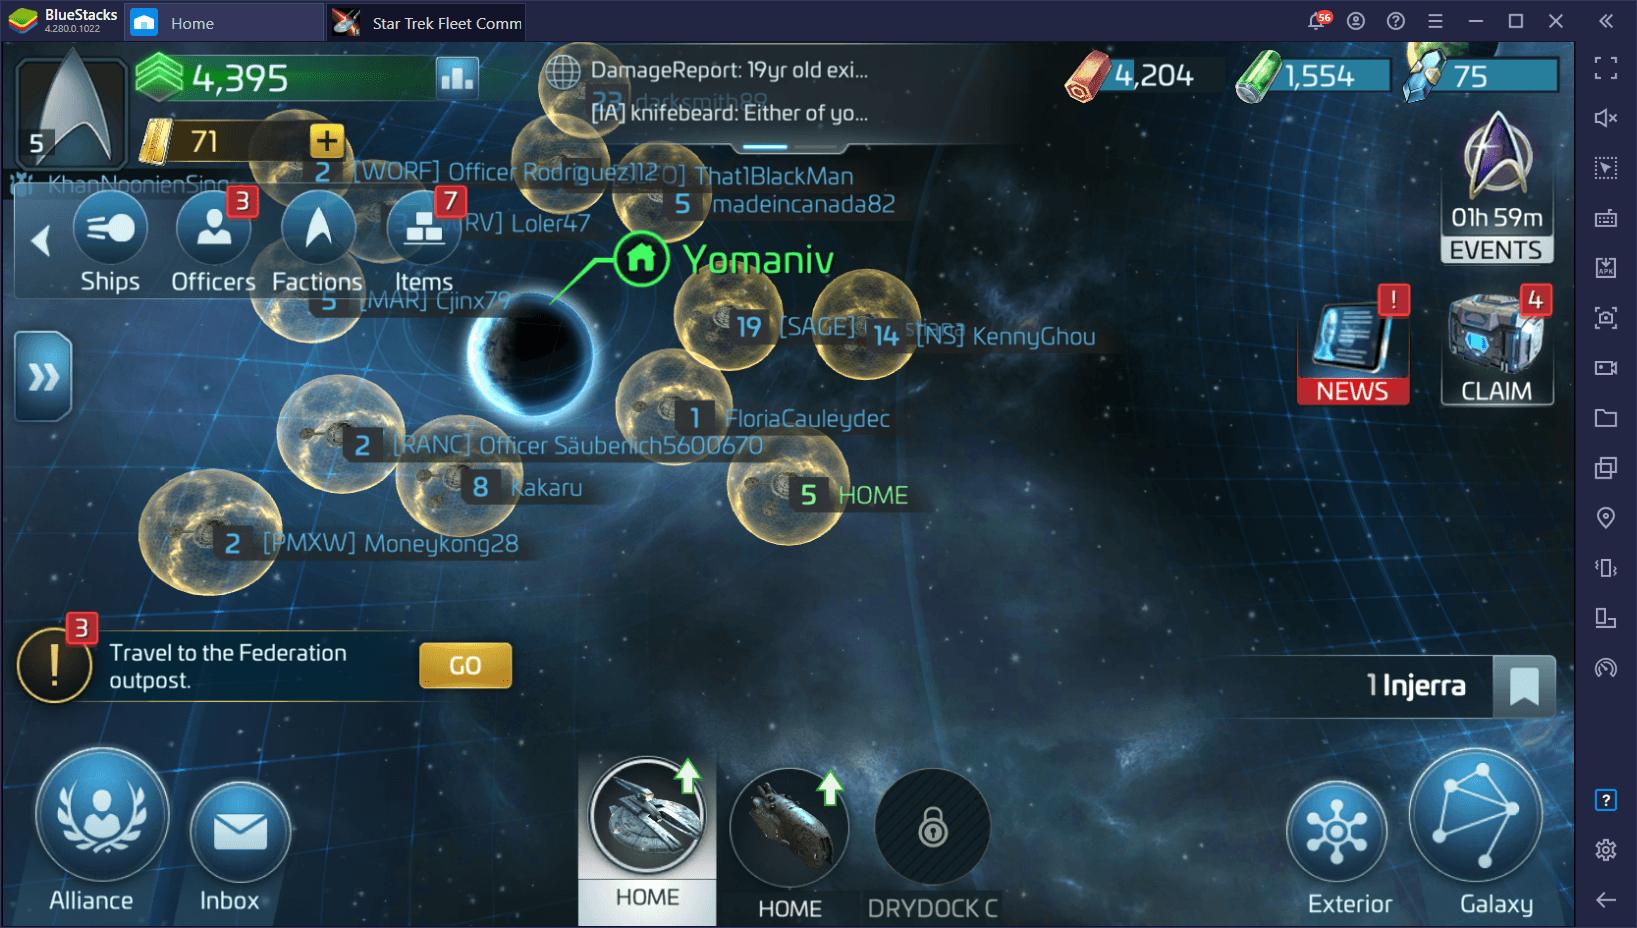 How to Play Star Trek Fleet Command on PC with BlueStacks